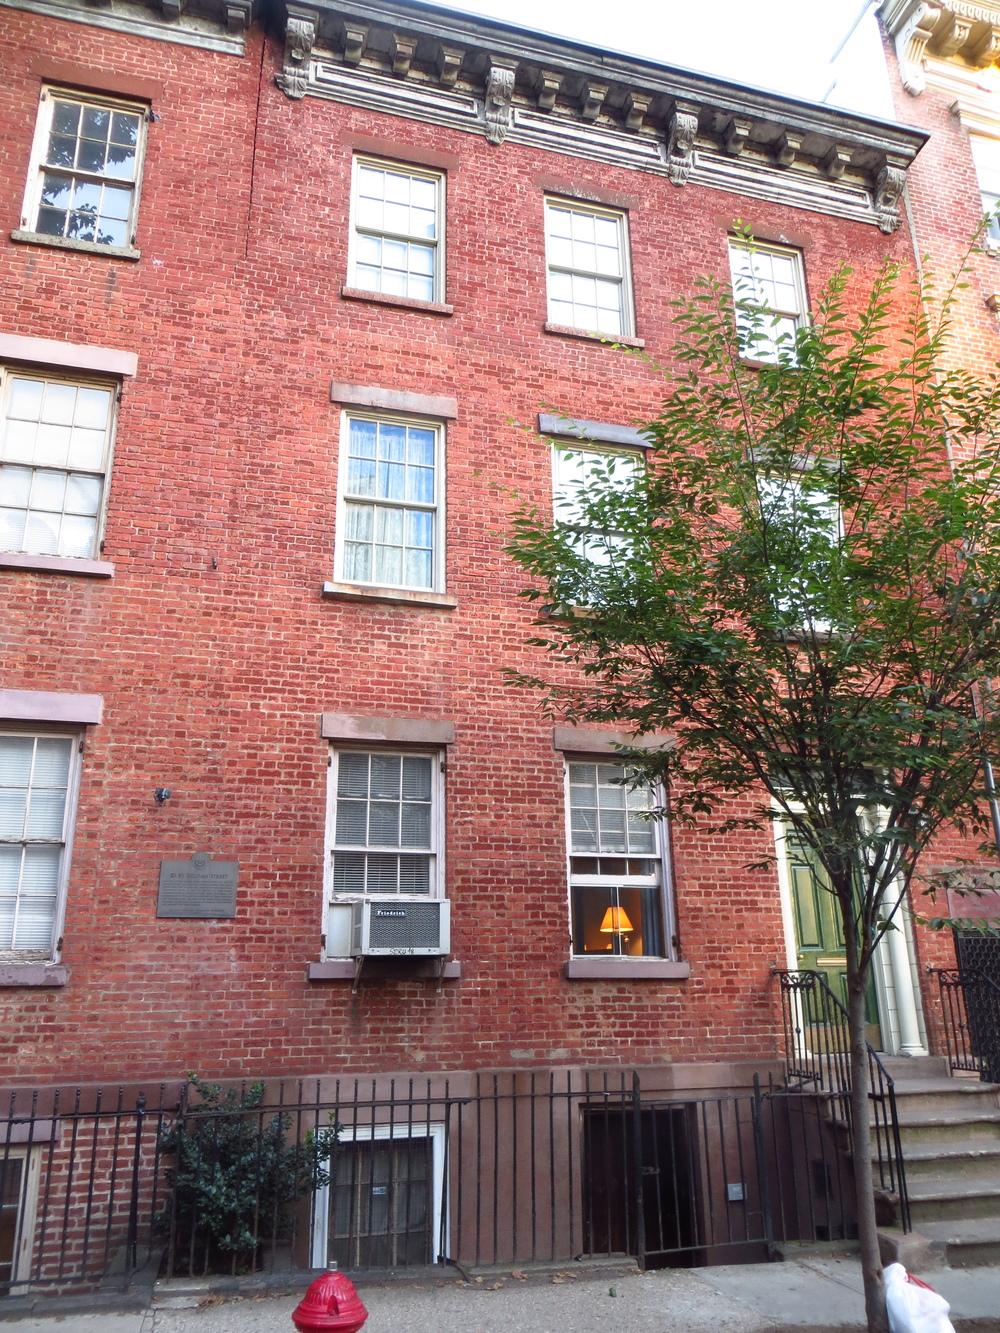 Sullivan St. houses